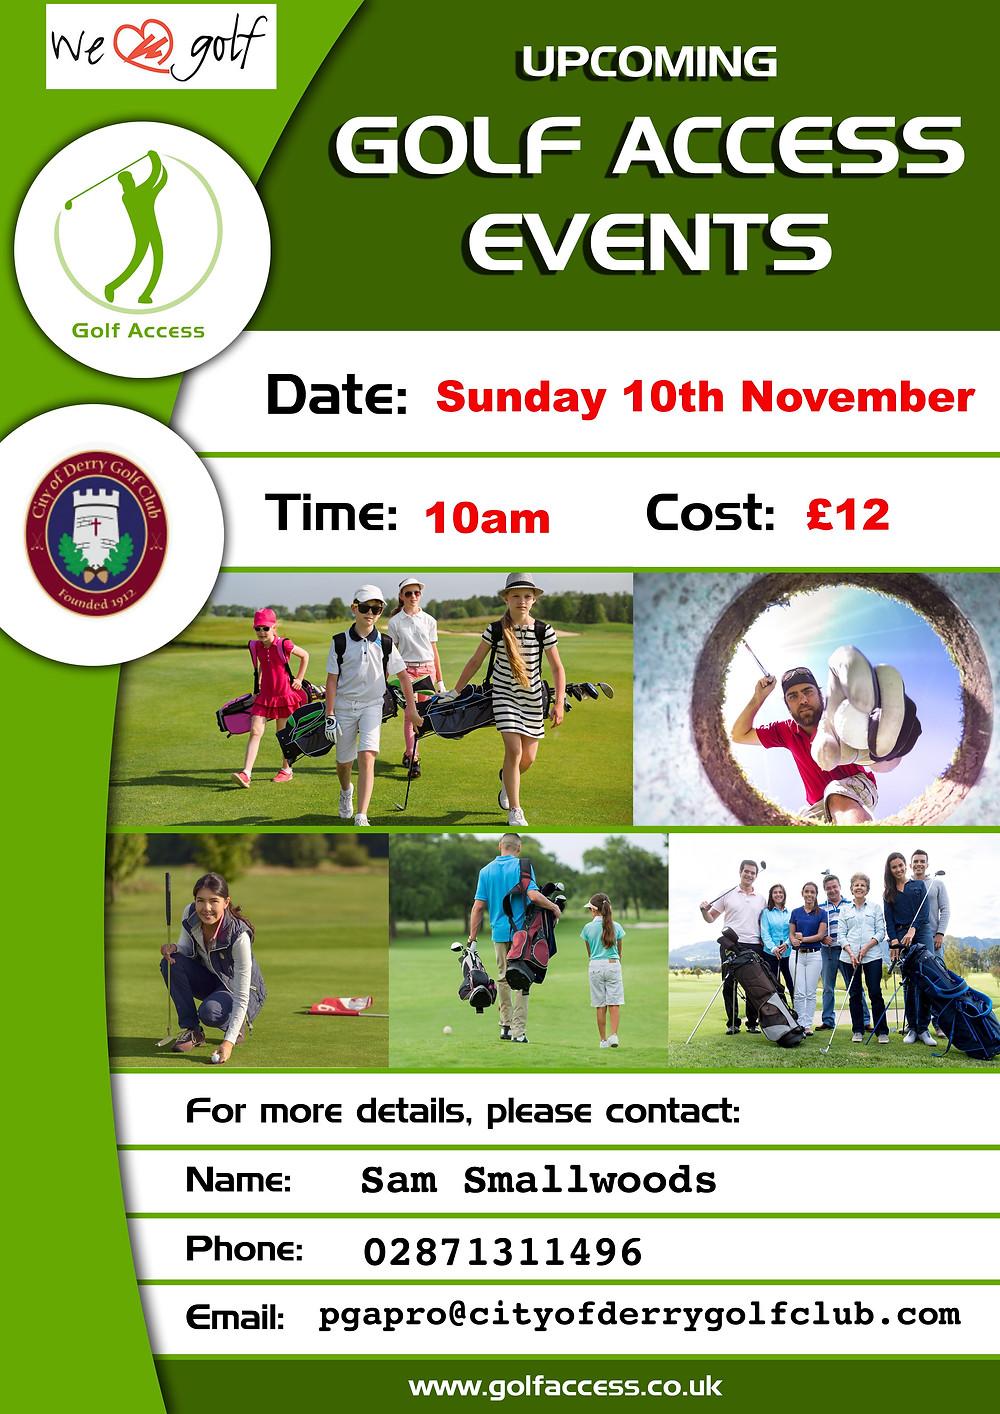 Golf Access event - City of Derry Golf Club